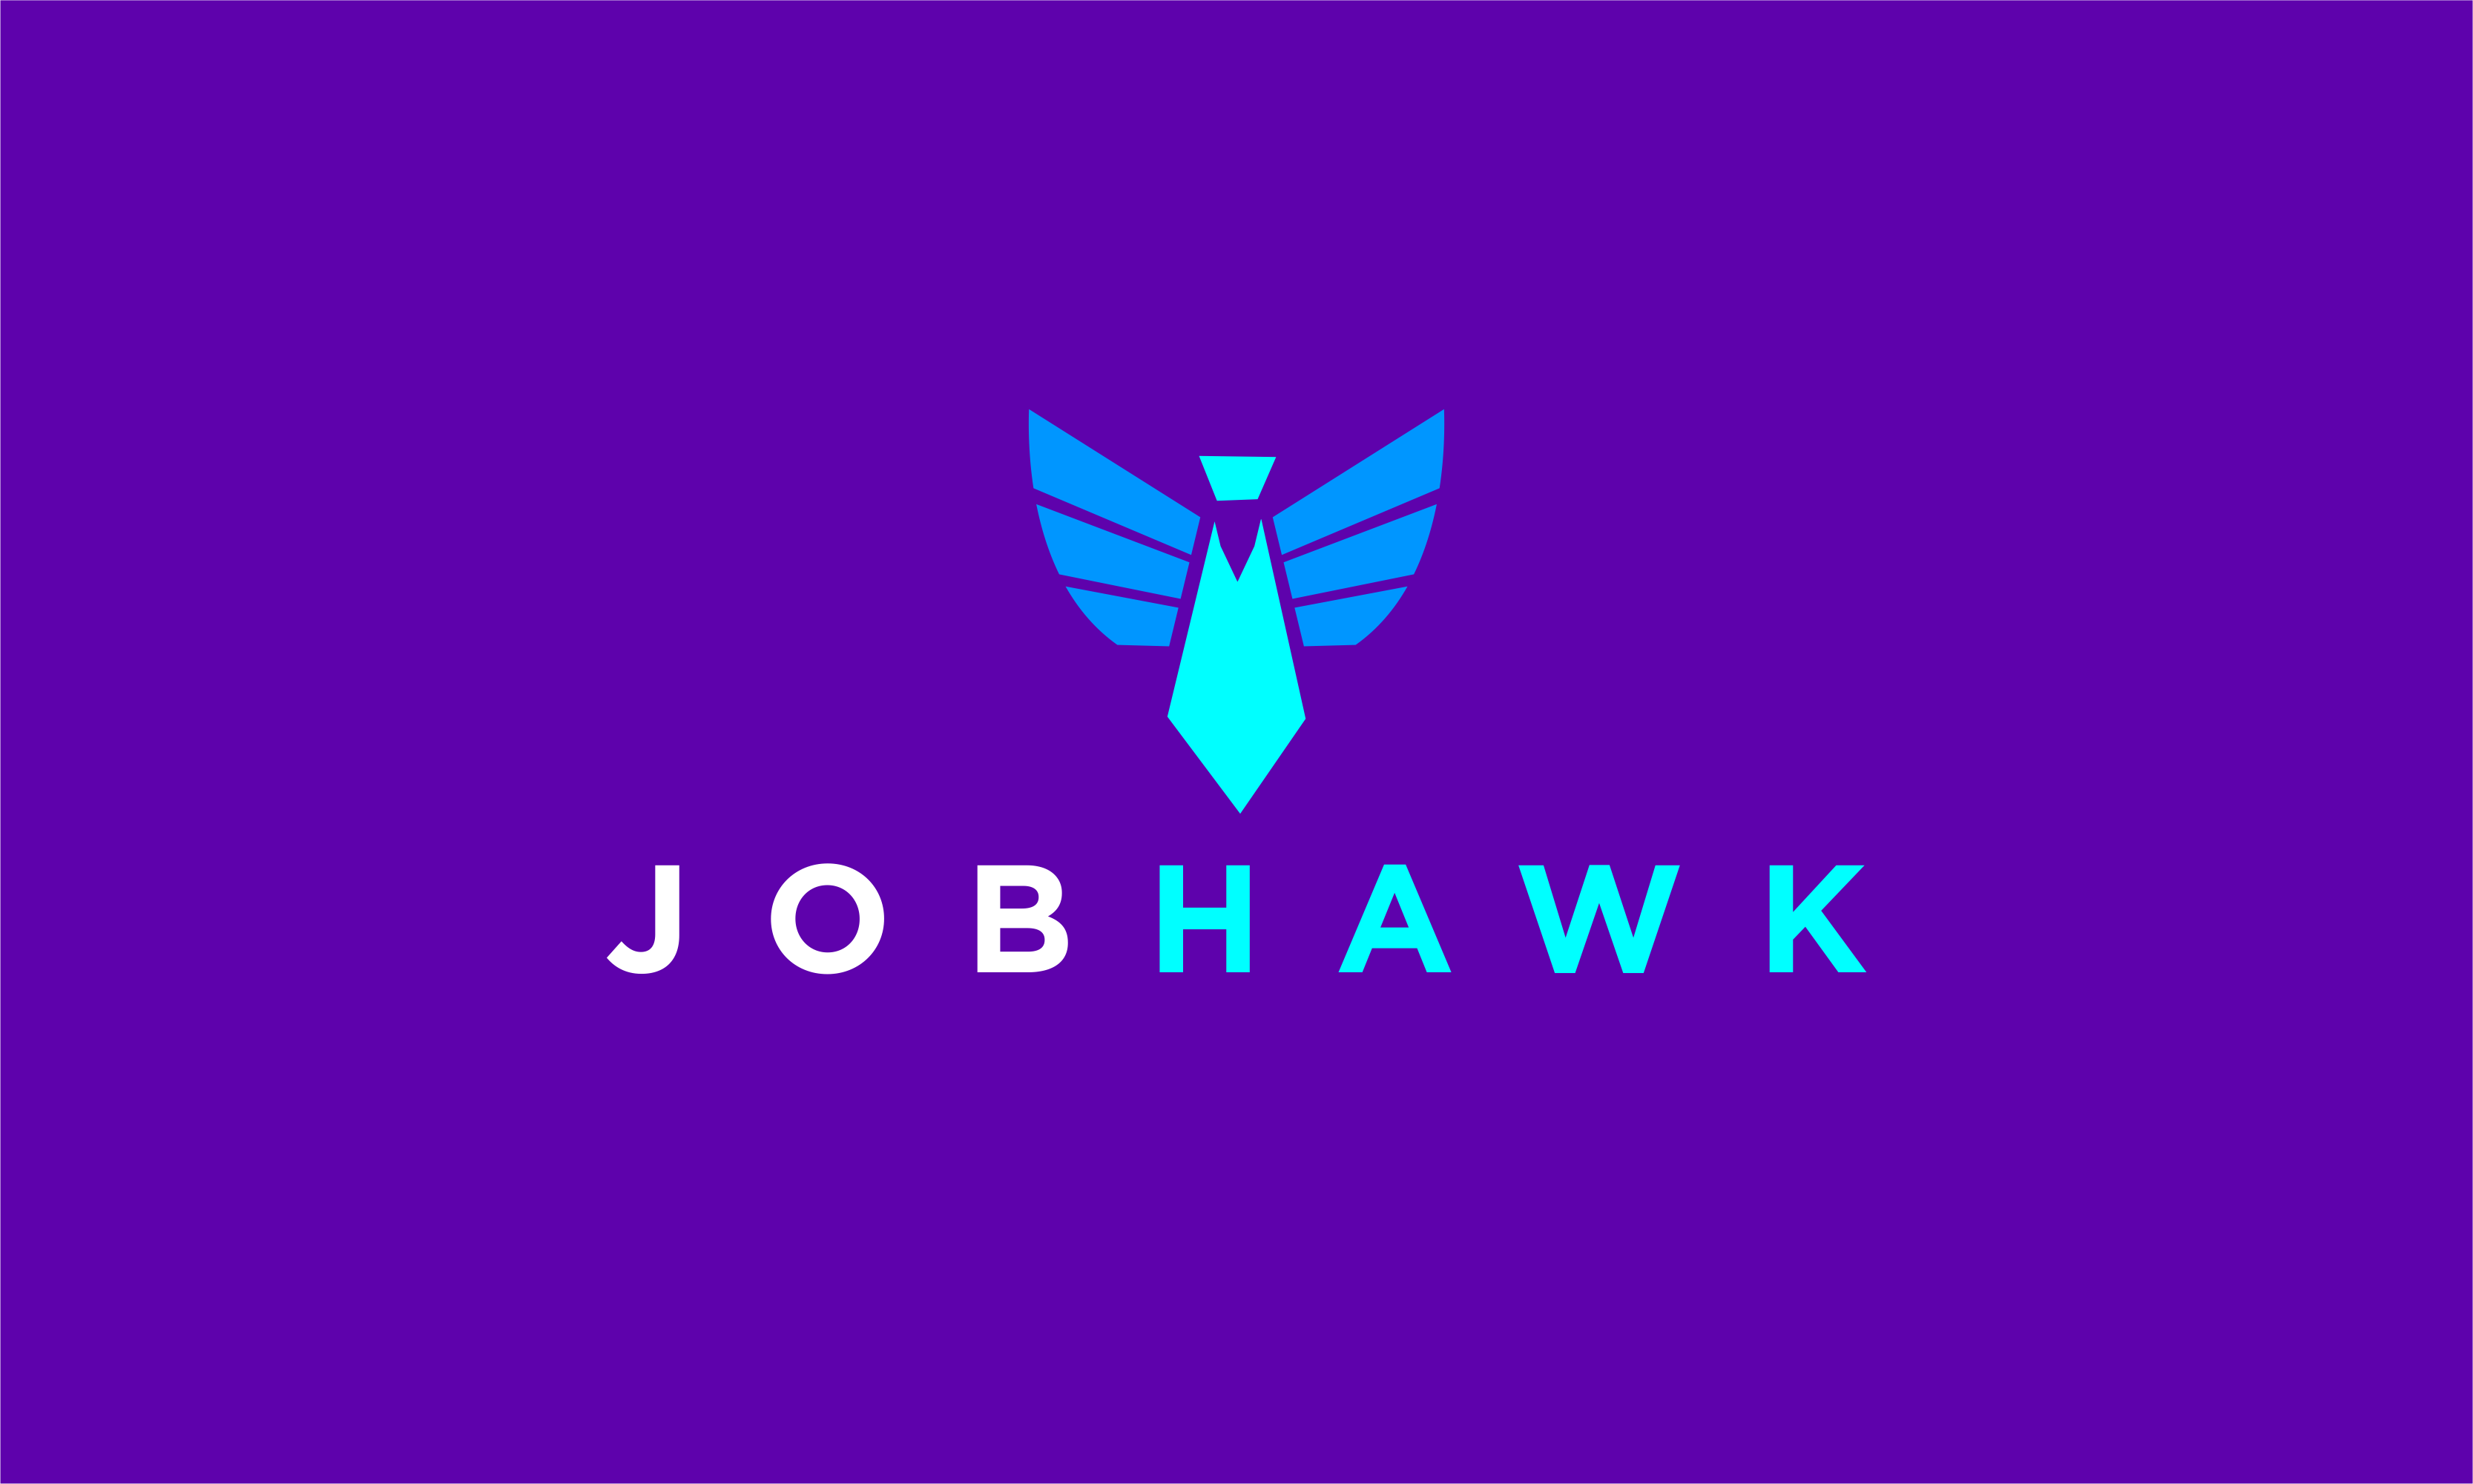 Jobhawk